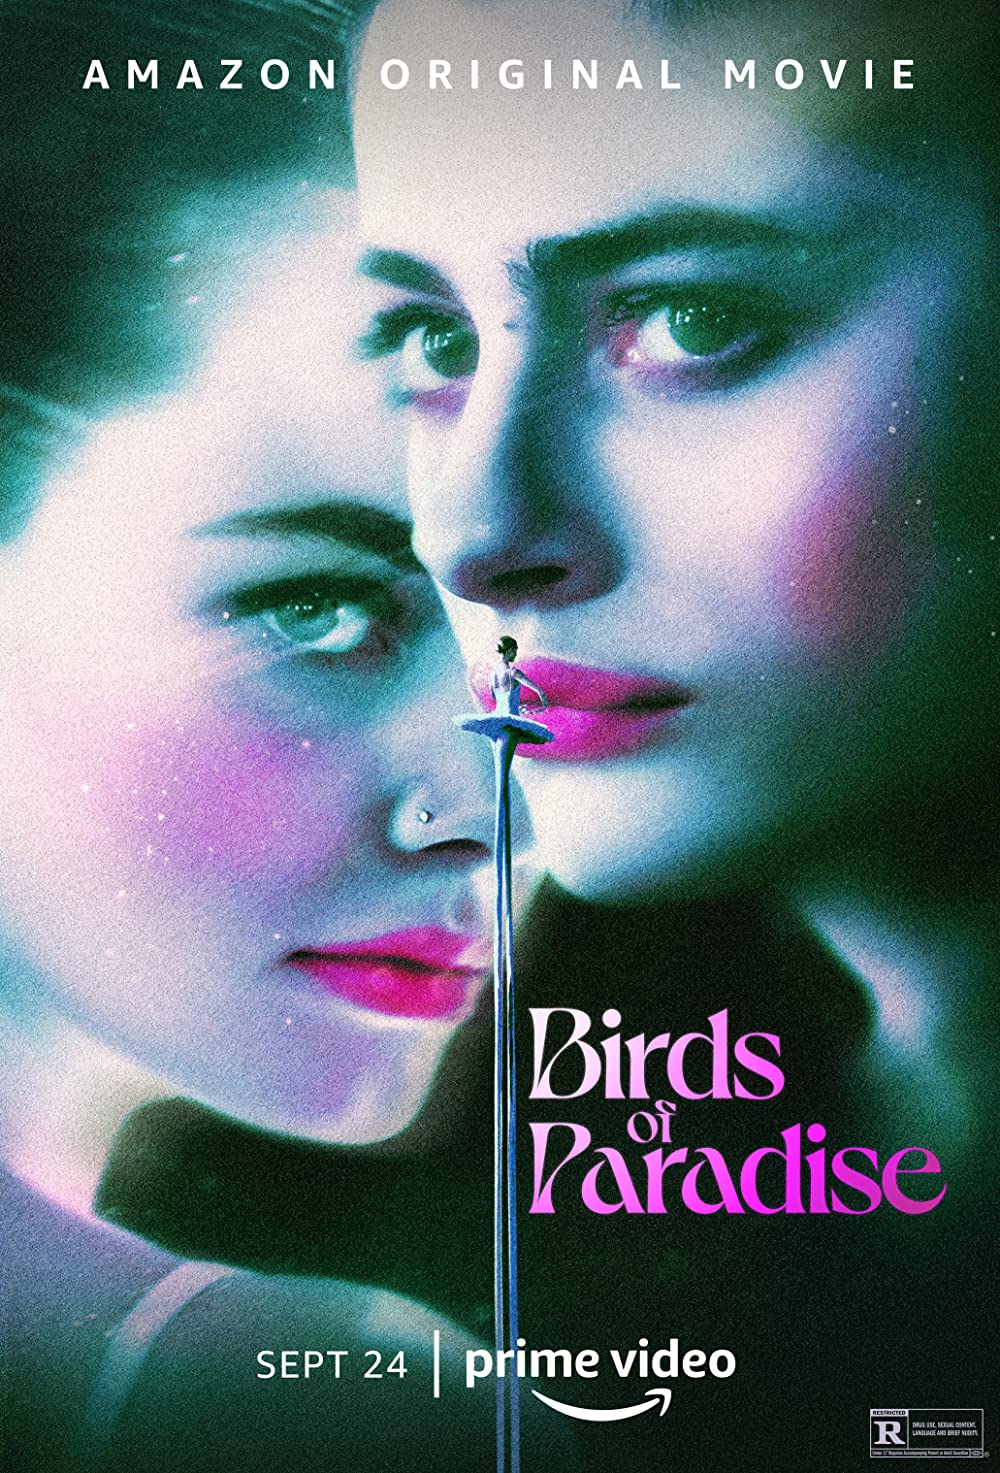 Birds of Paradise 2021 English Movie 720p AMZN HDRip MSub Download